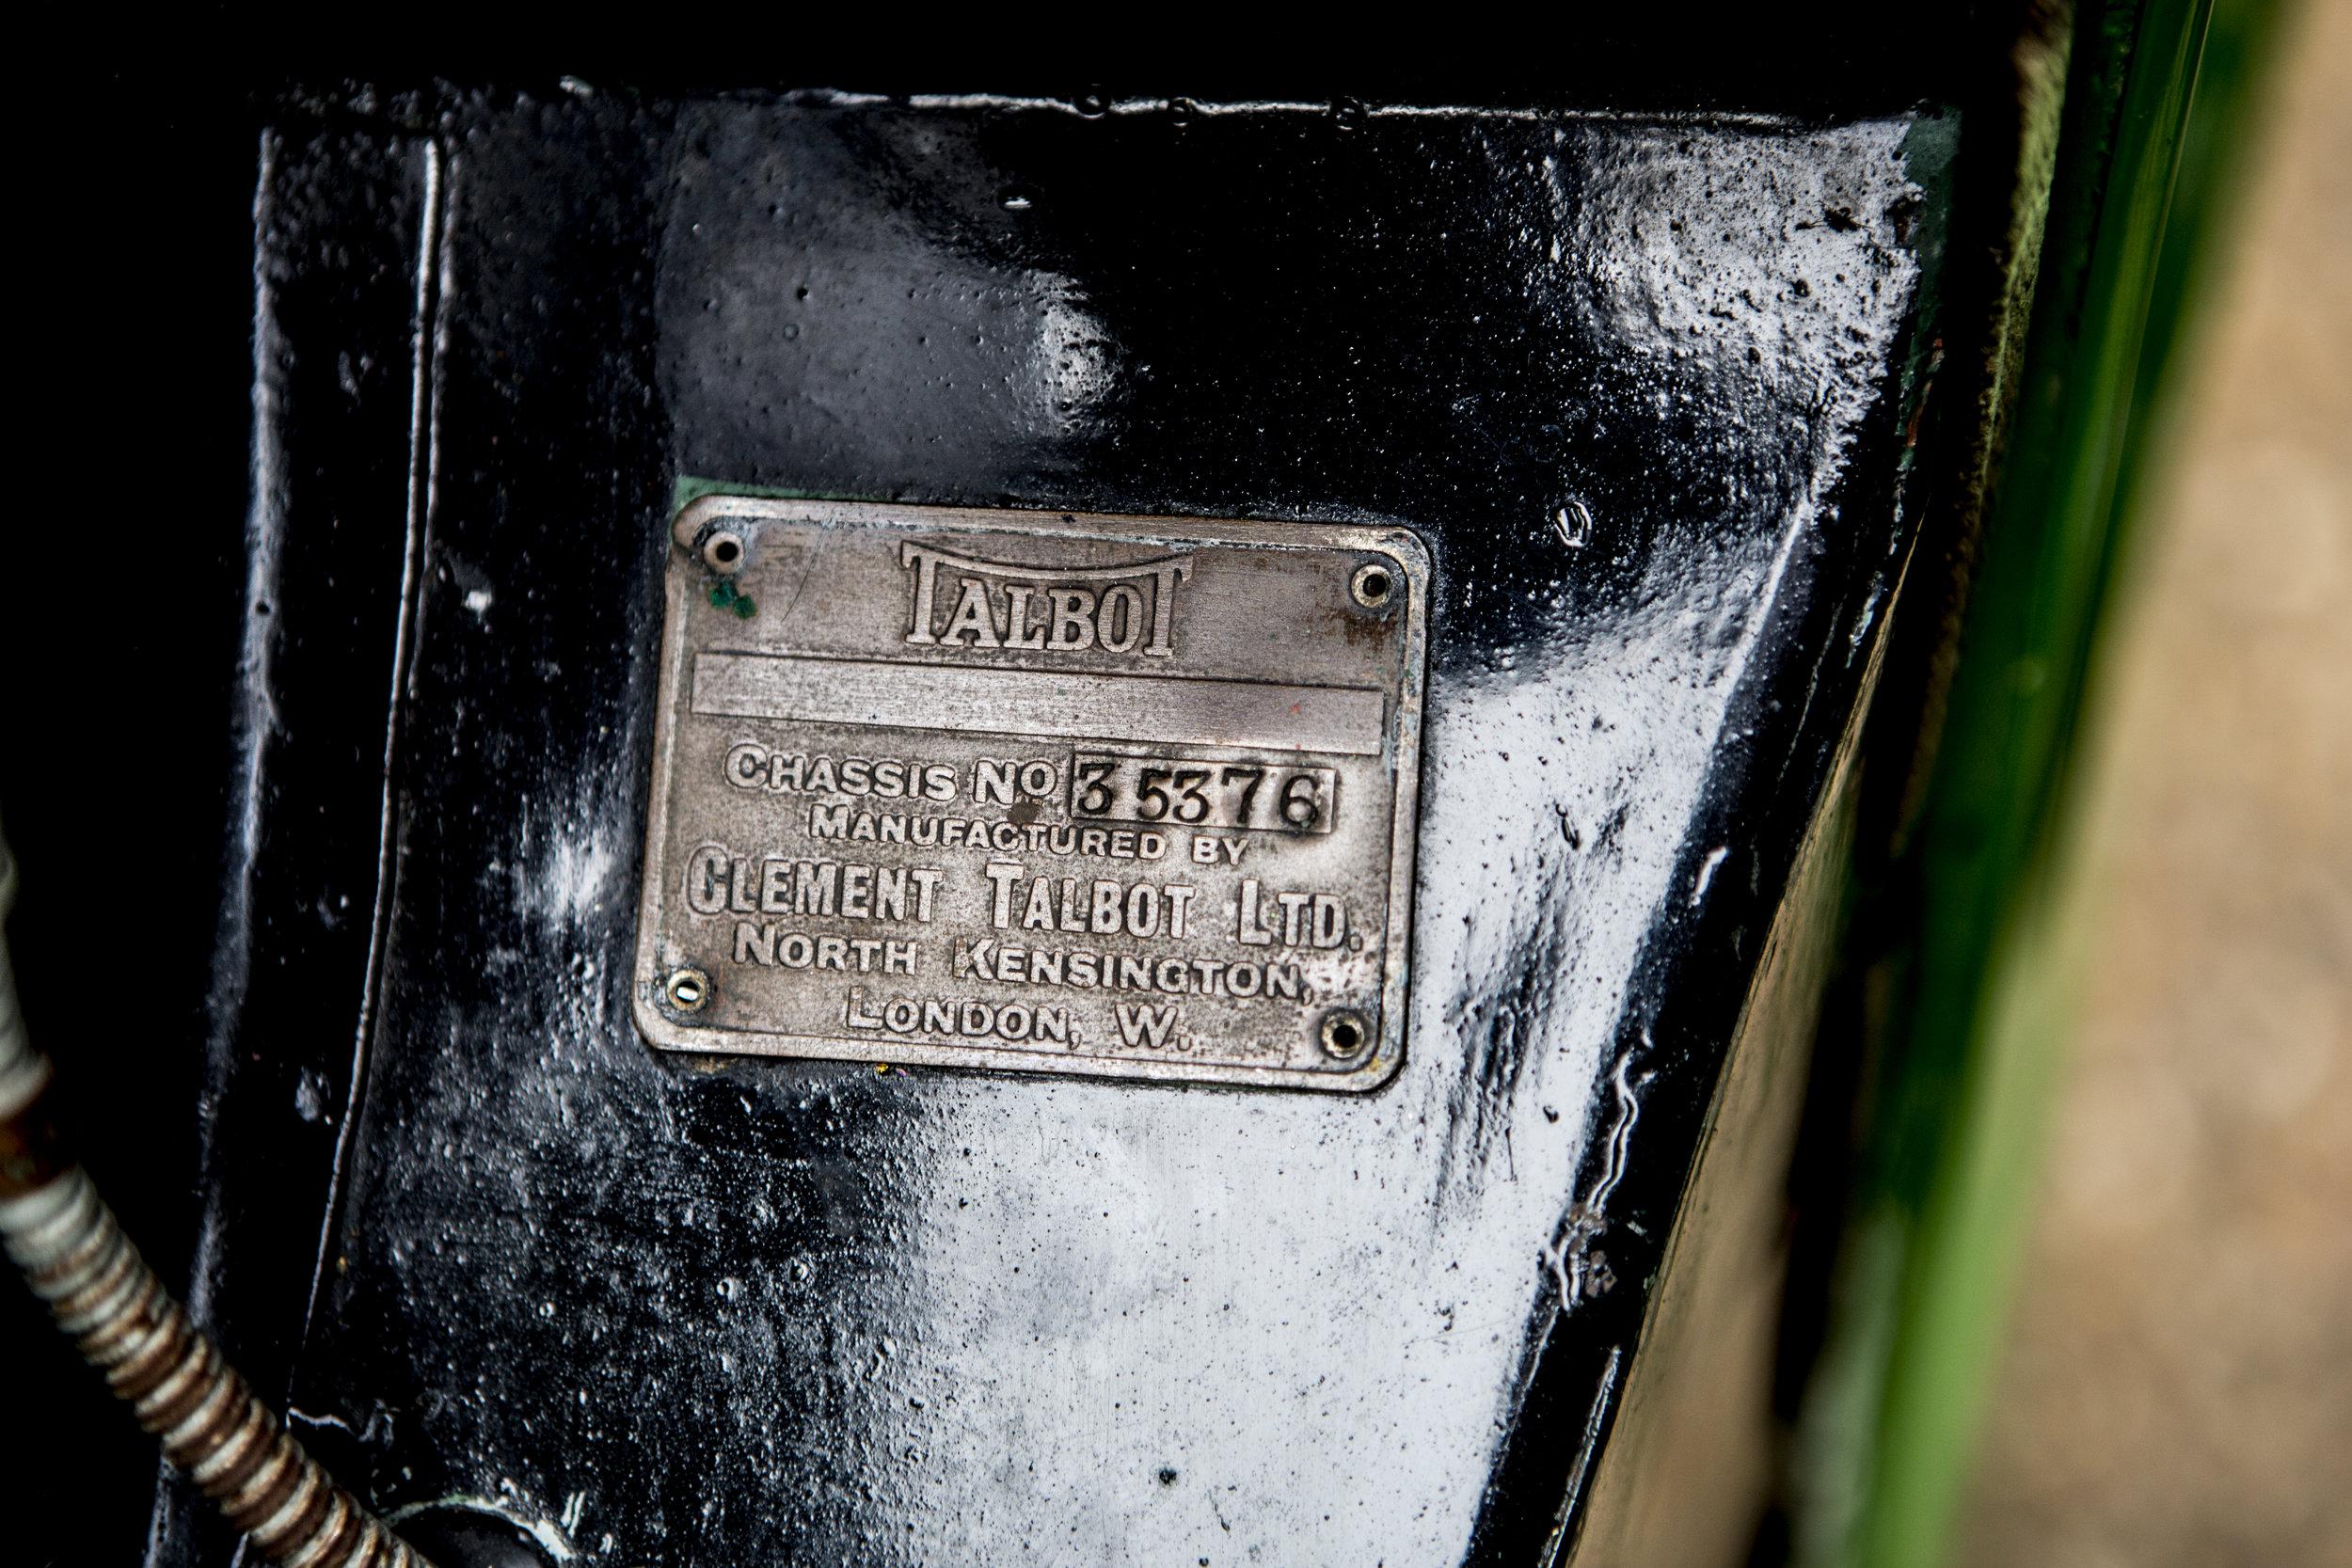 7C5A7559.JPG